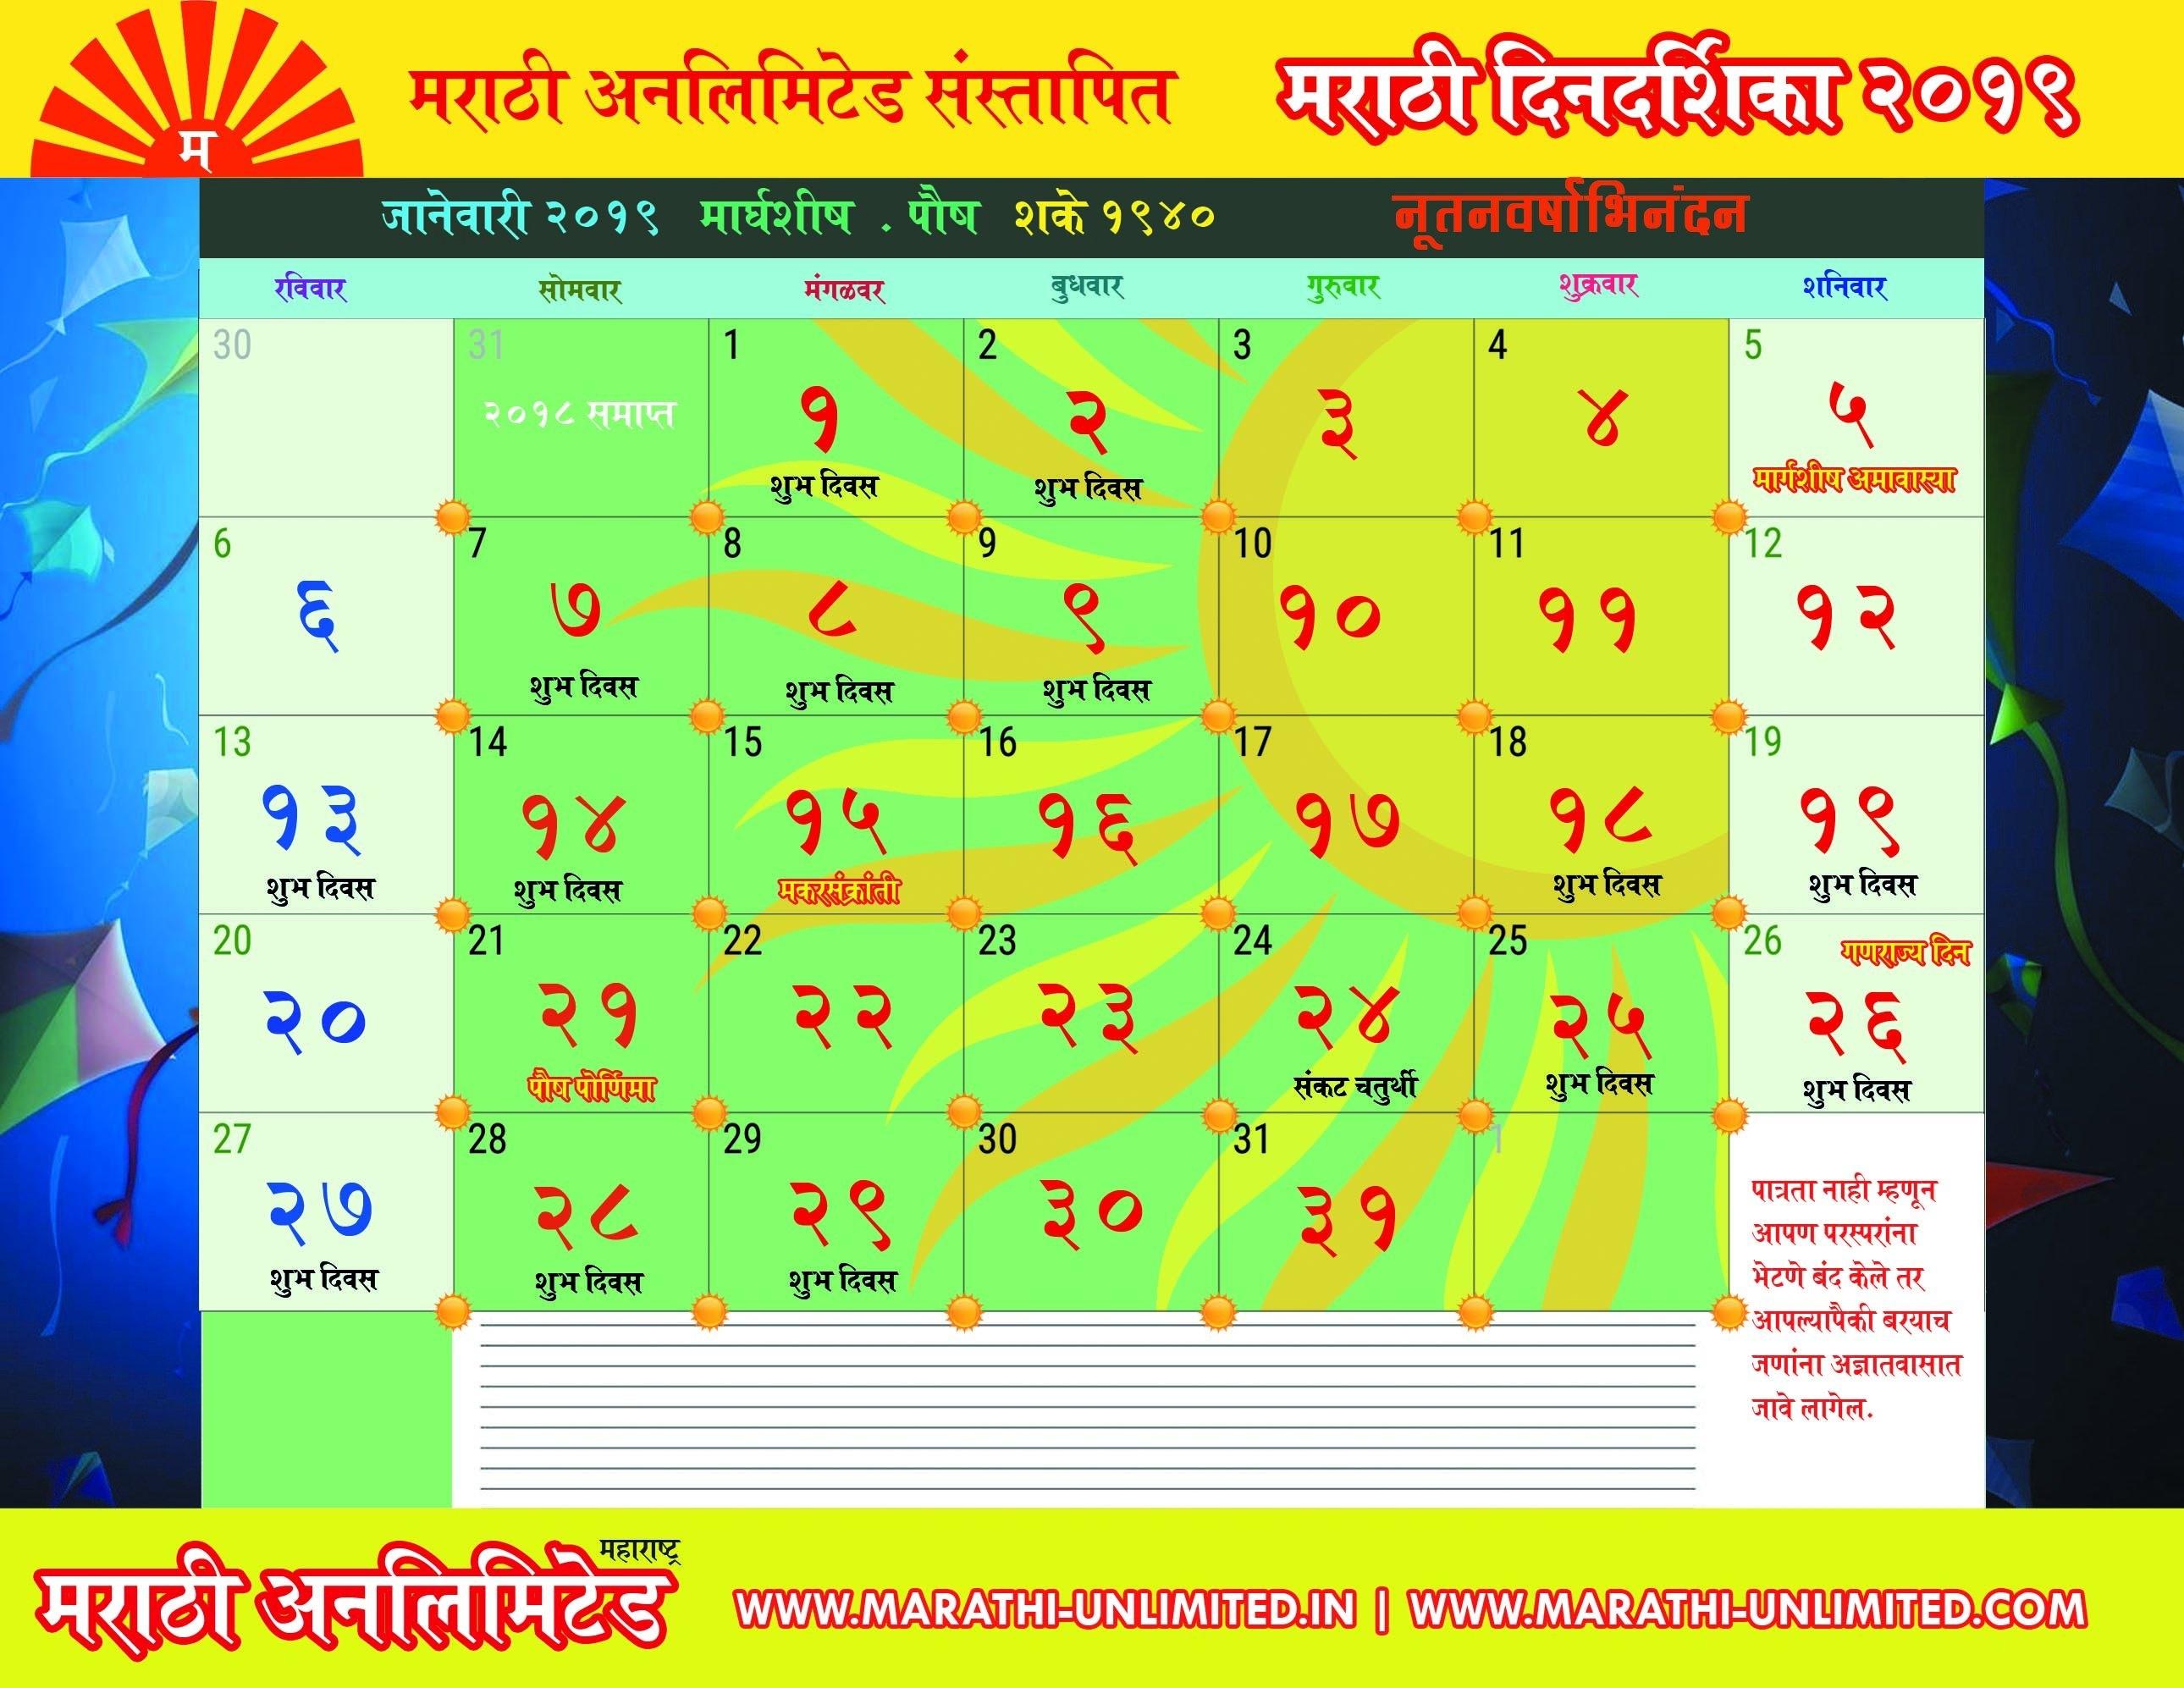 Marathi Calendar 2019 Pdf Version [Free Download] Marathi Almanac E Calendar Kalnirnay 2019